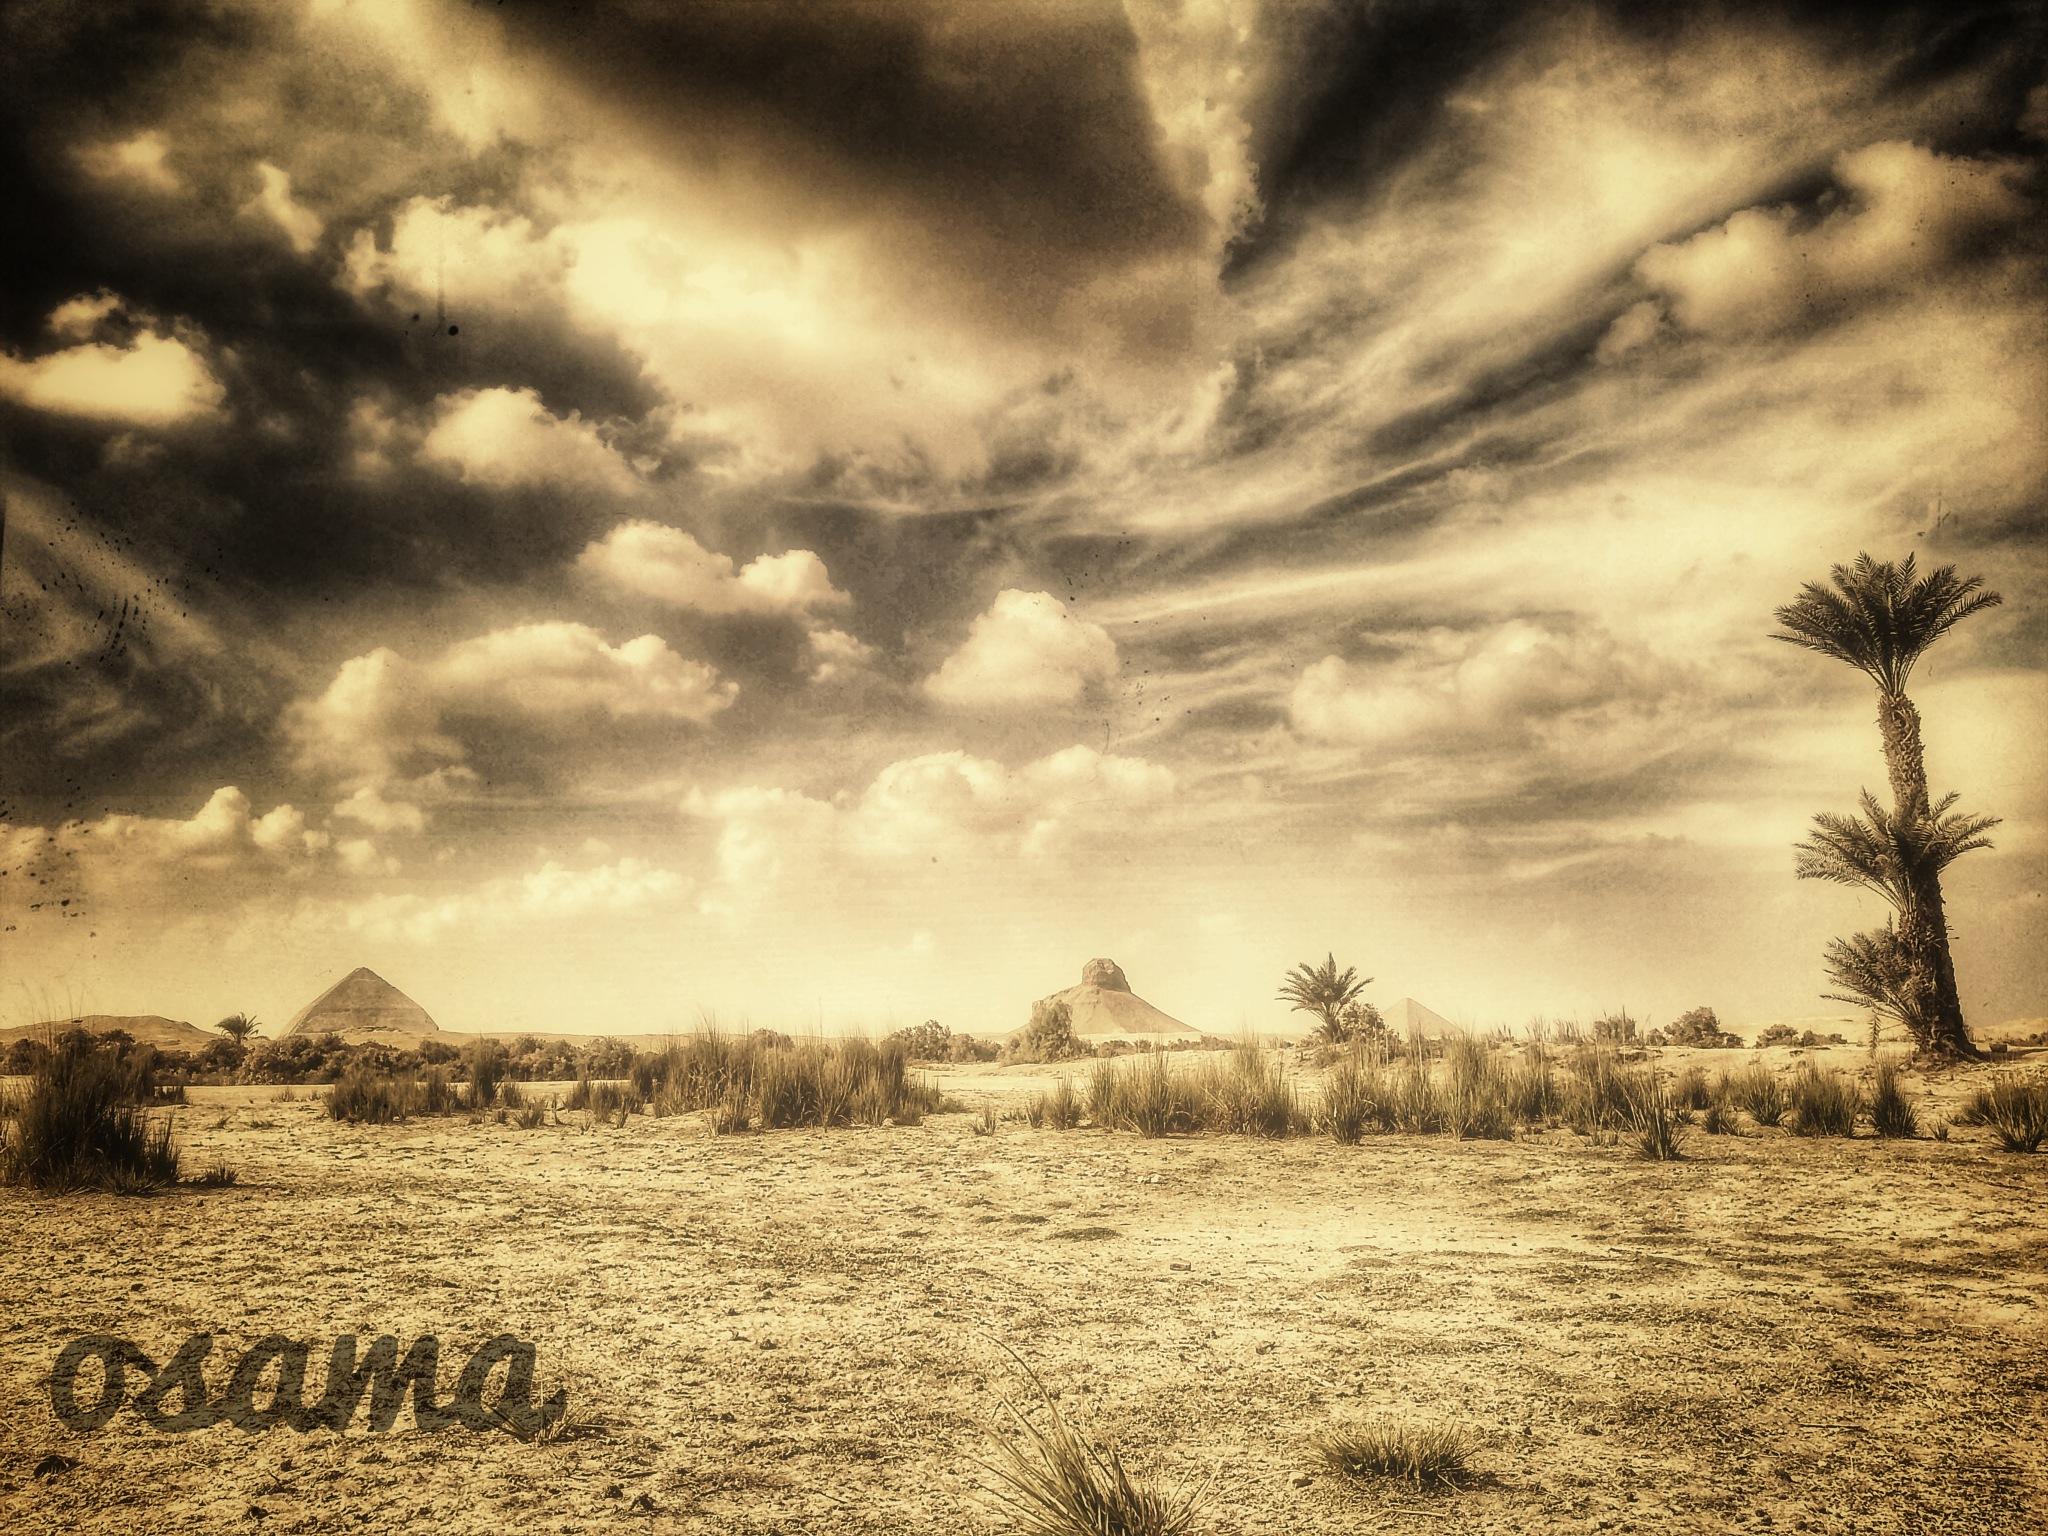 Dahshour pyramids by Usama Taha